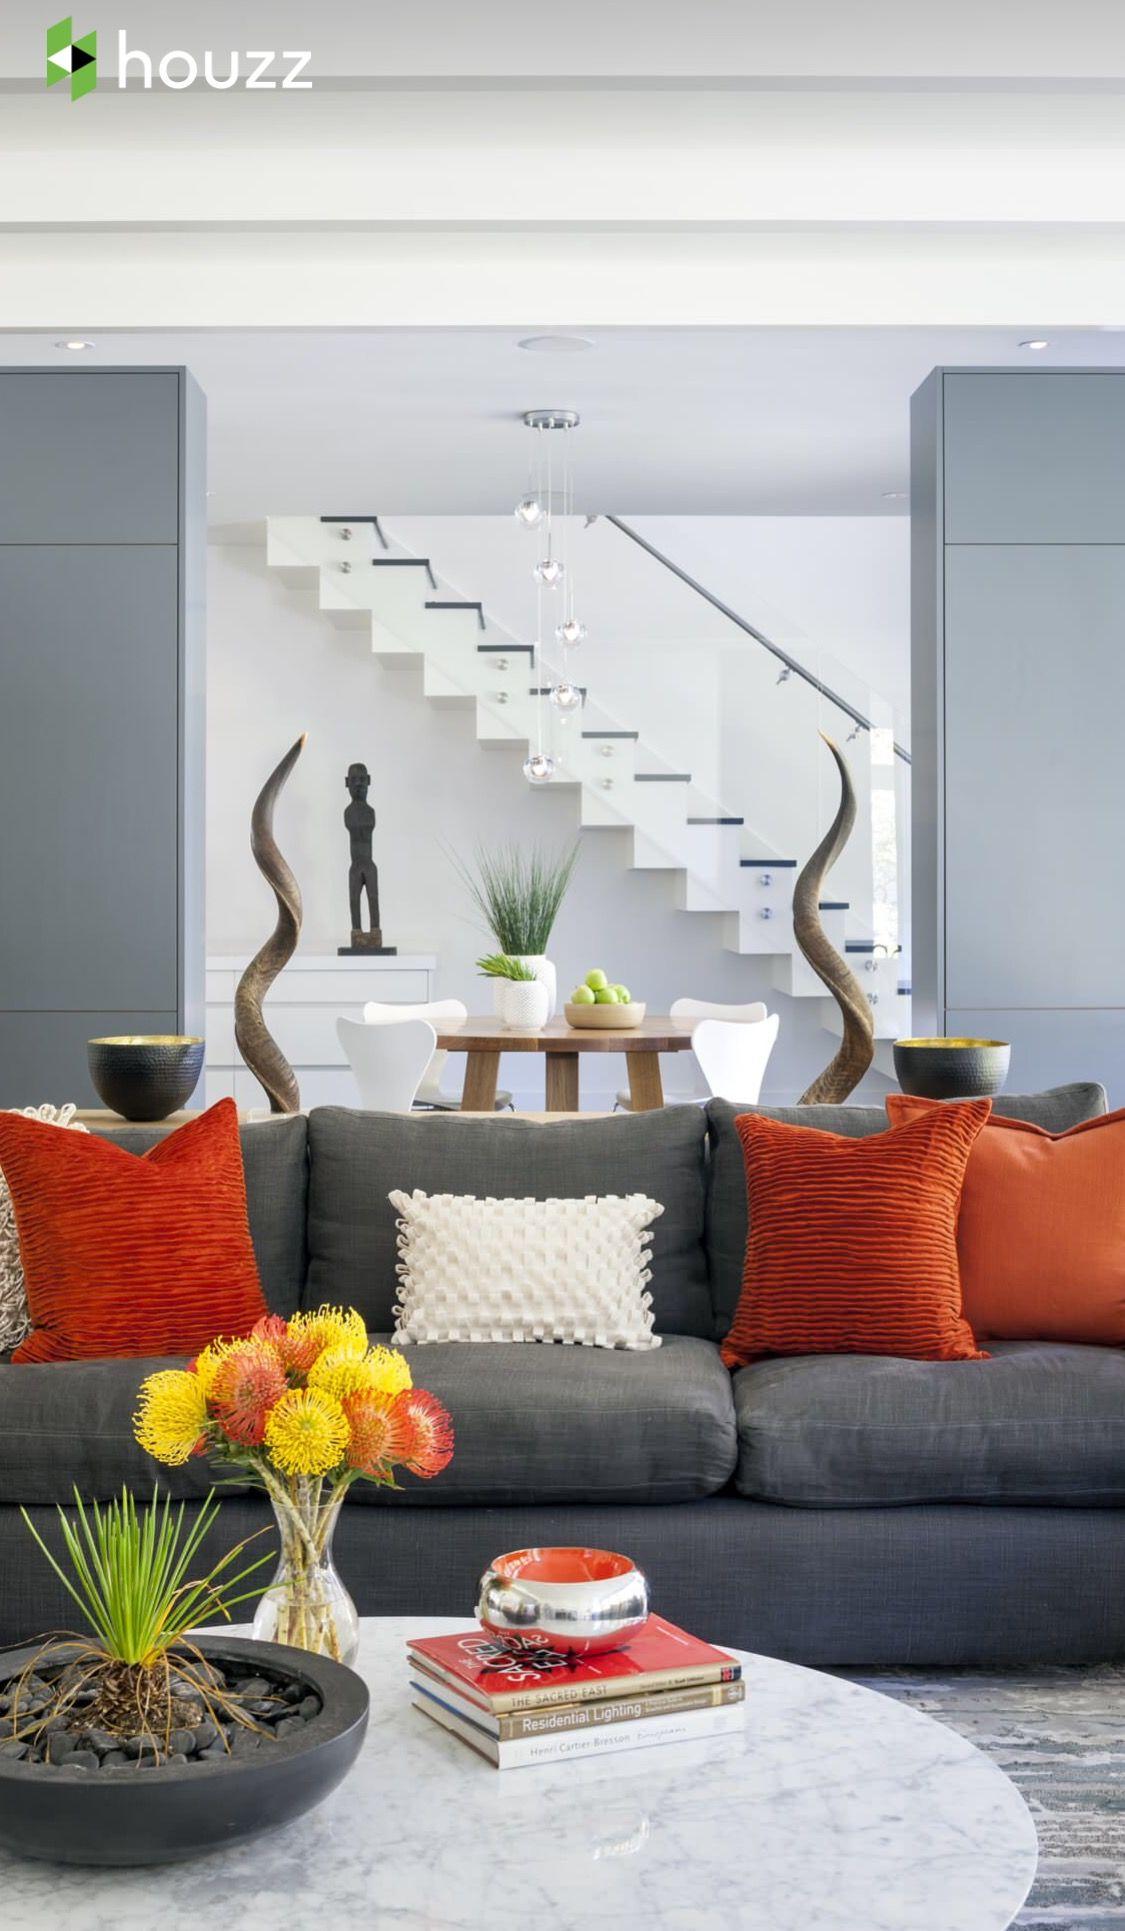 Pin by Ne-ne Flournoy on Peachy, Orange, & Coral Room Design\'s ...